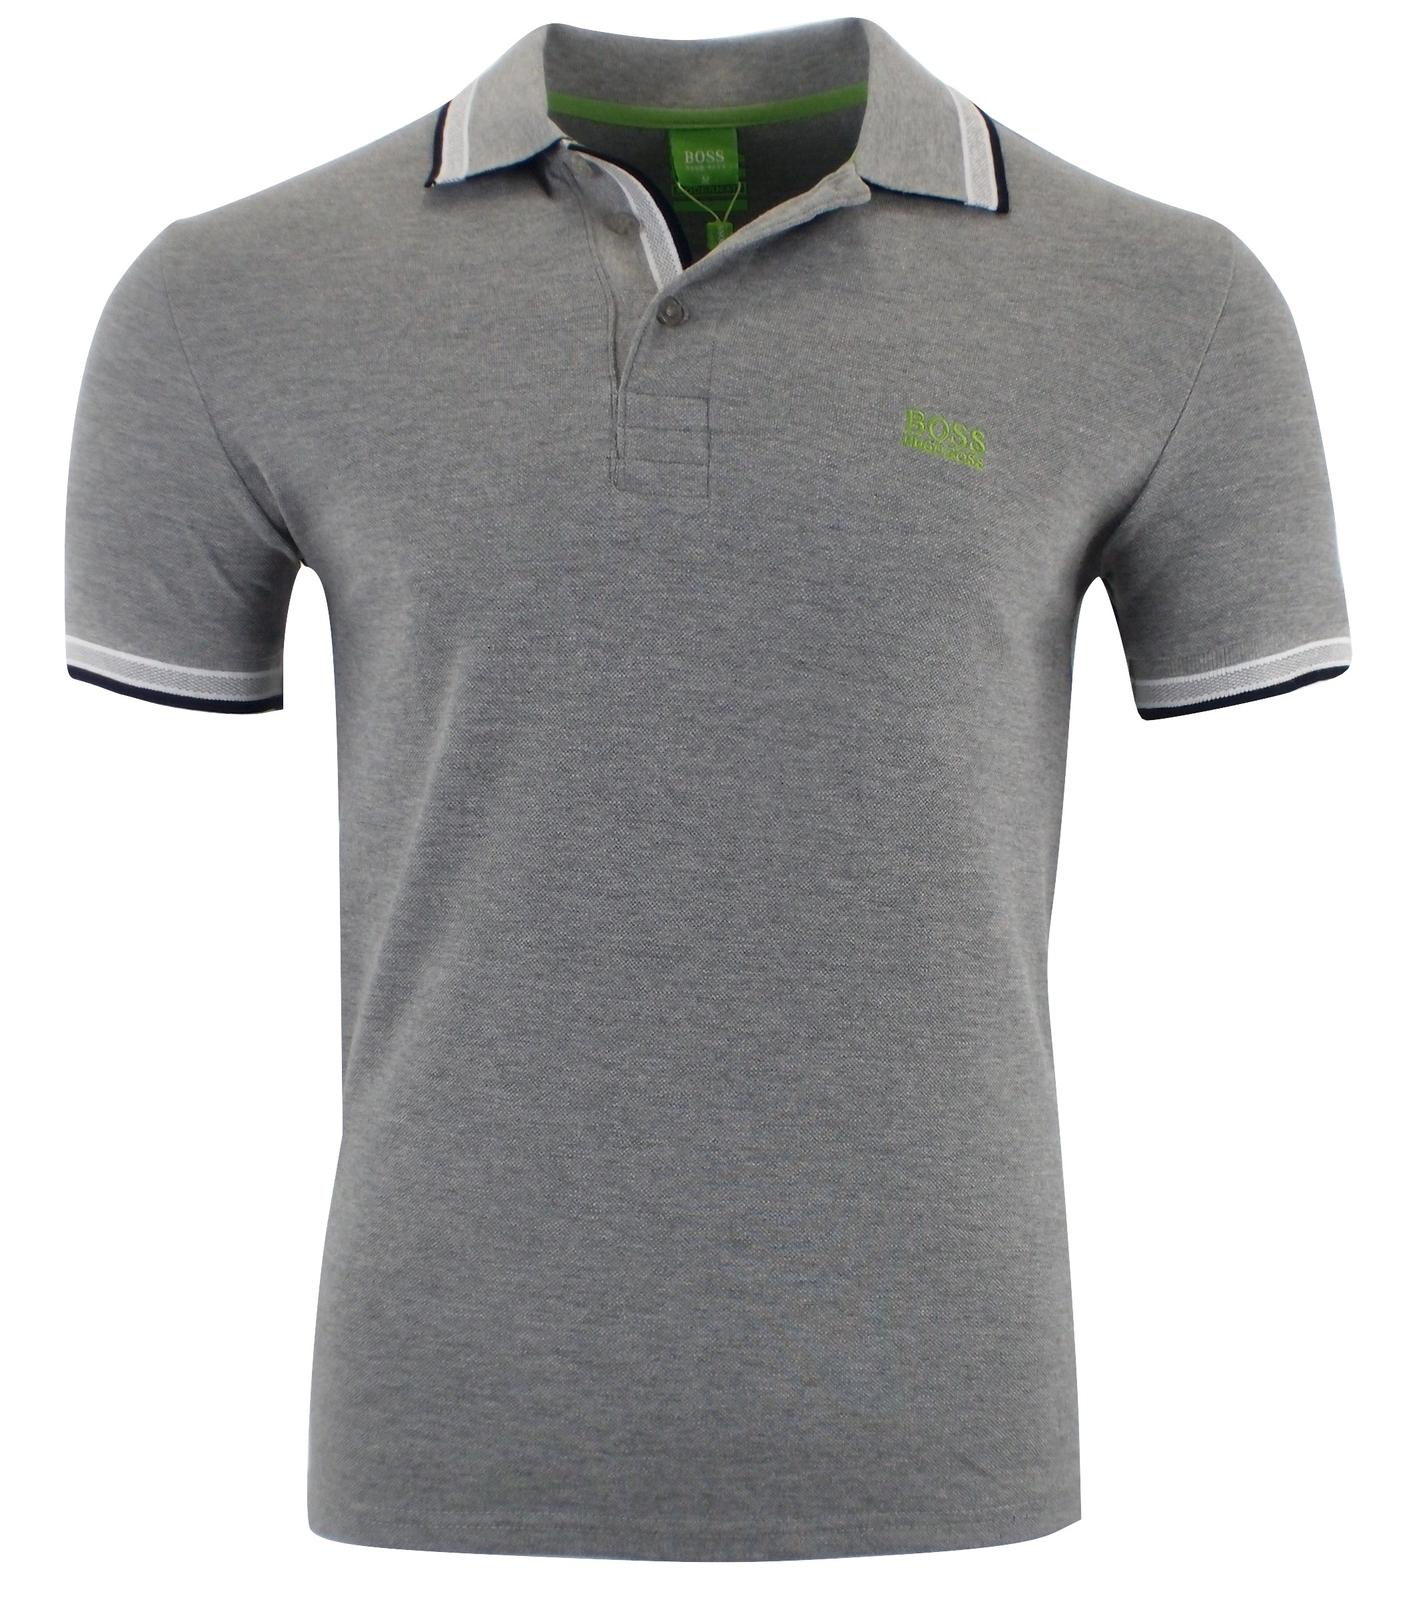 Hugo Boss Men's Short Sleeve Modern Fit 100% Cotton Polo Shirt GRAY S M L XL XXL for sale  USA